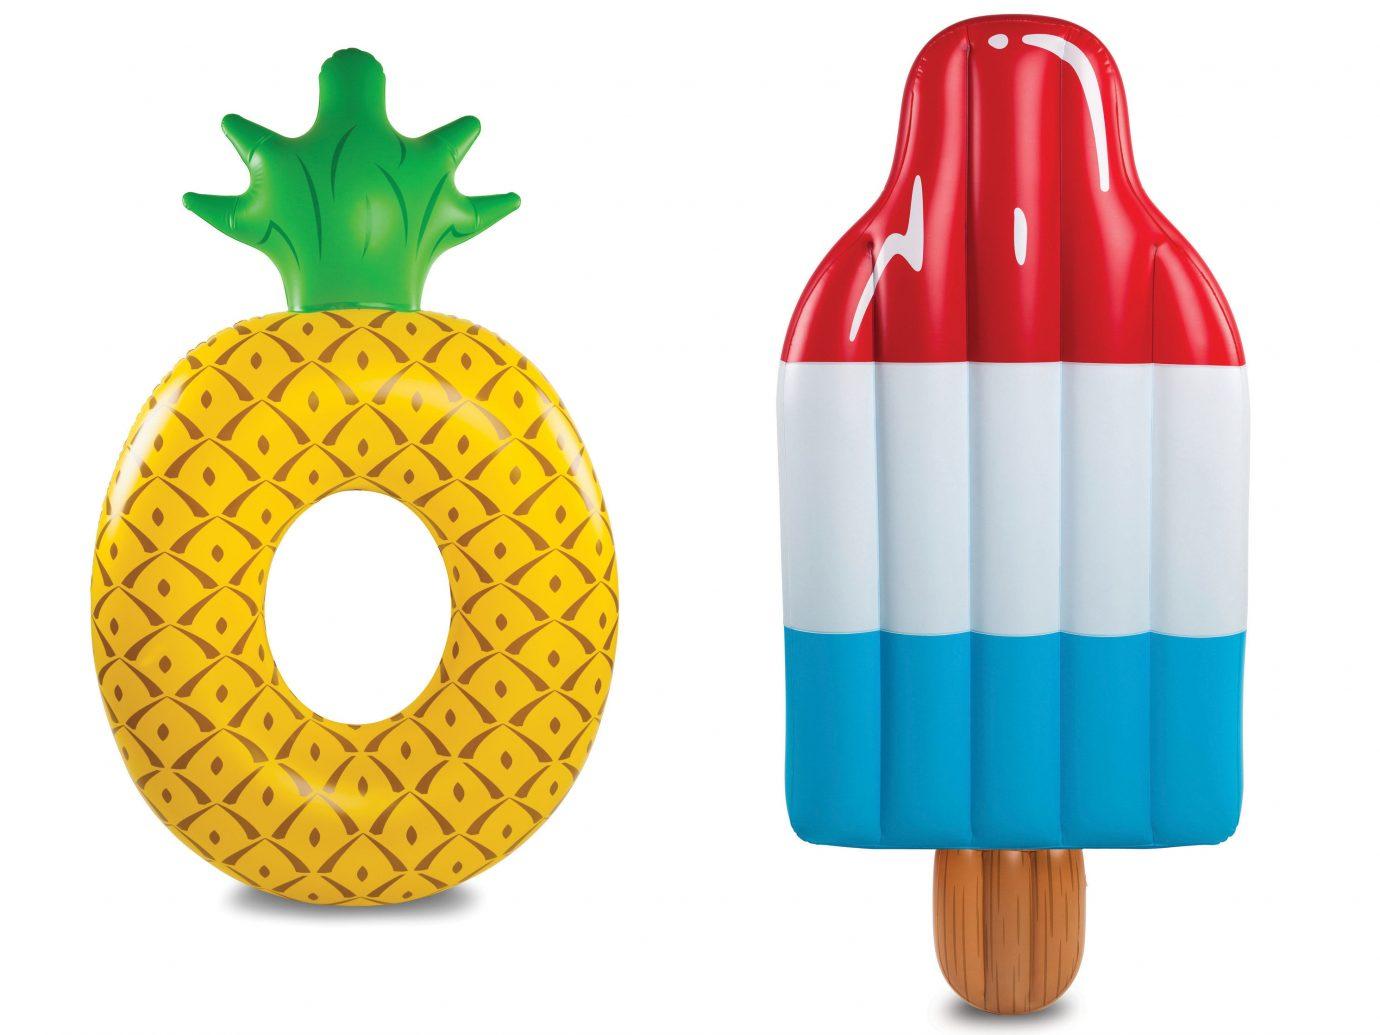 Offbeat product font food bottle produce illustration